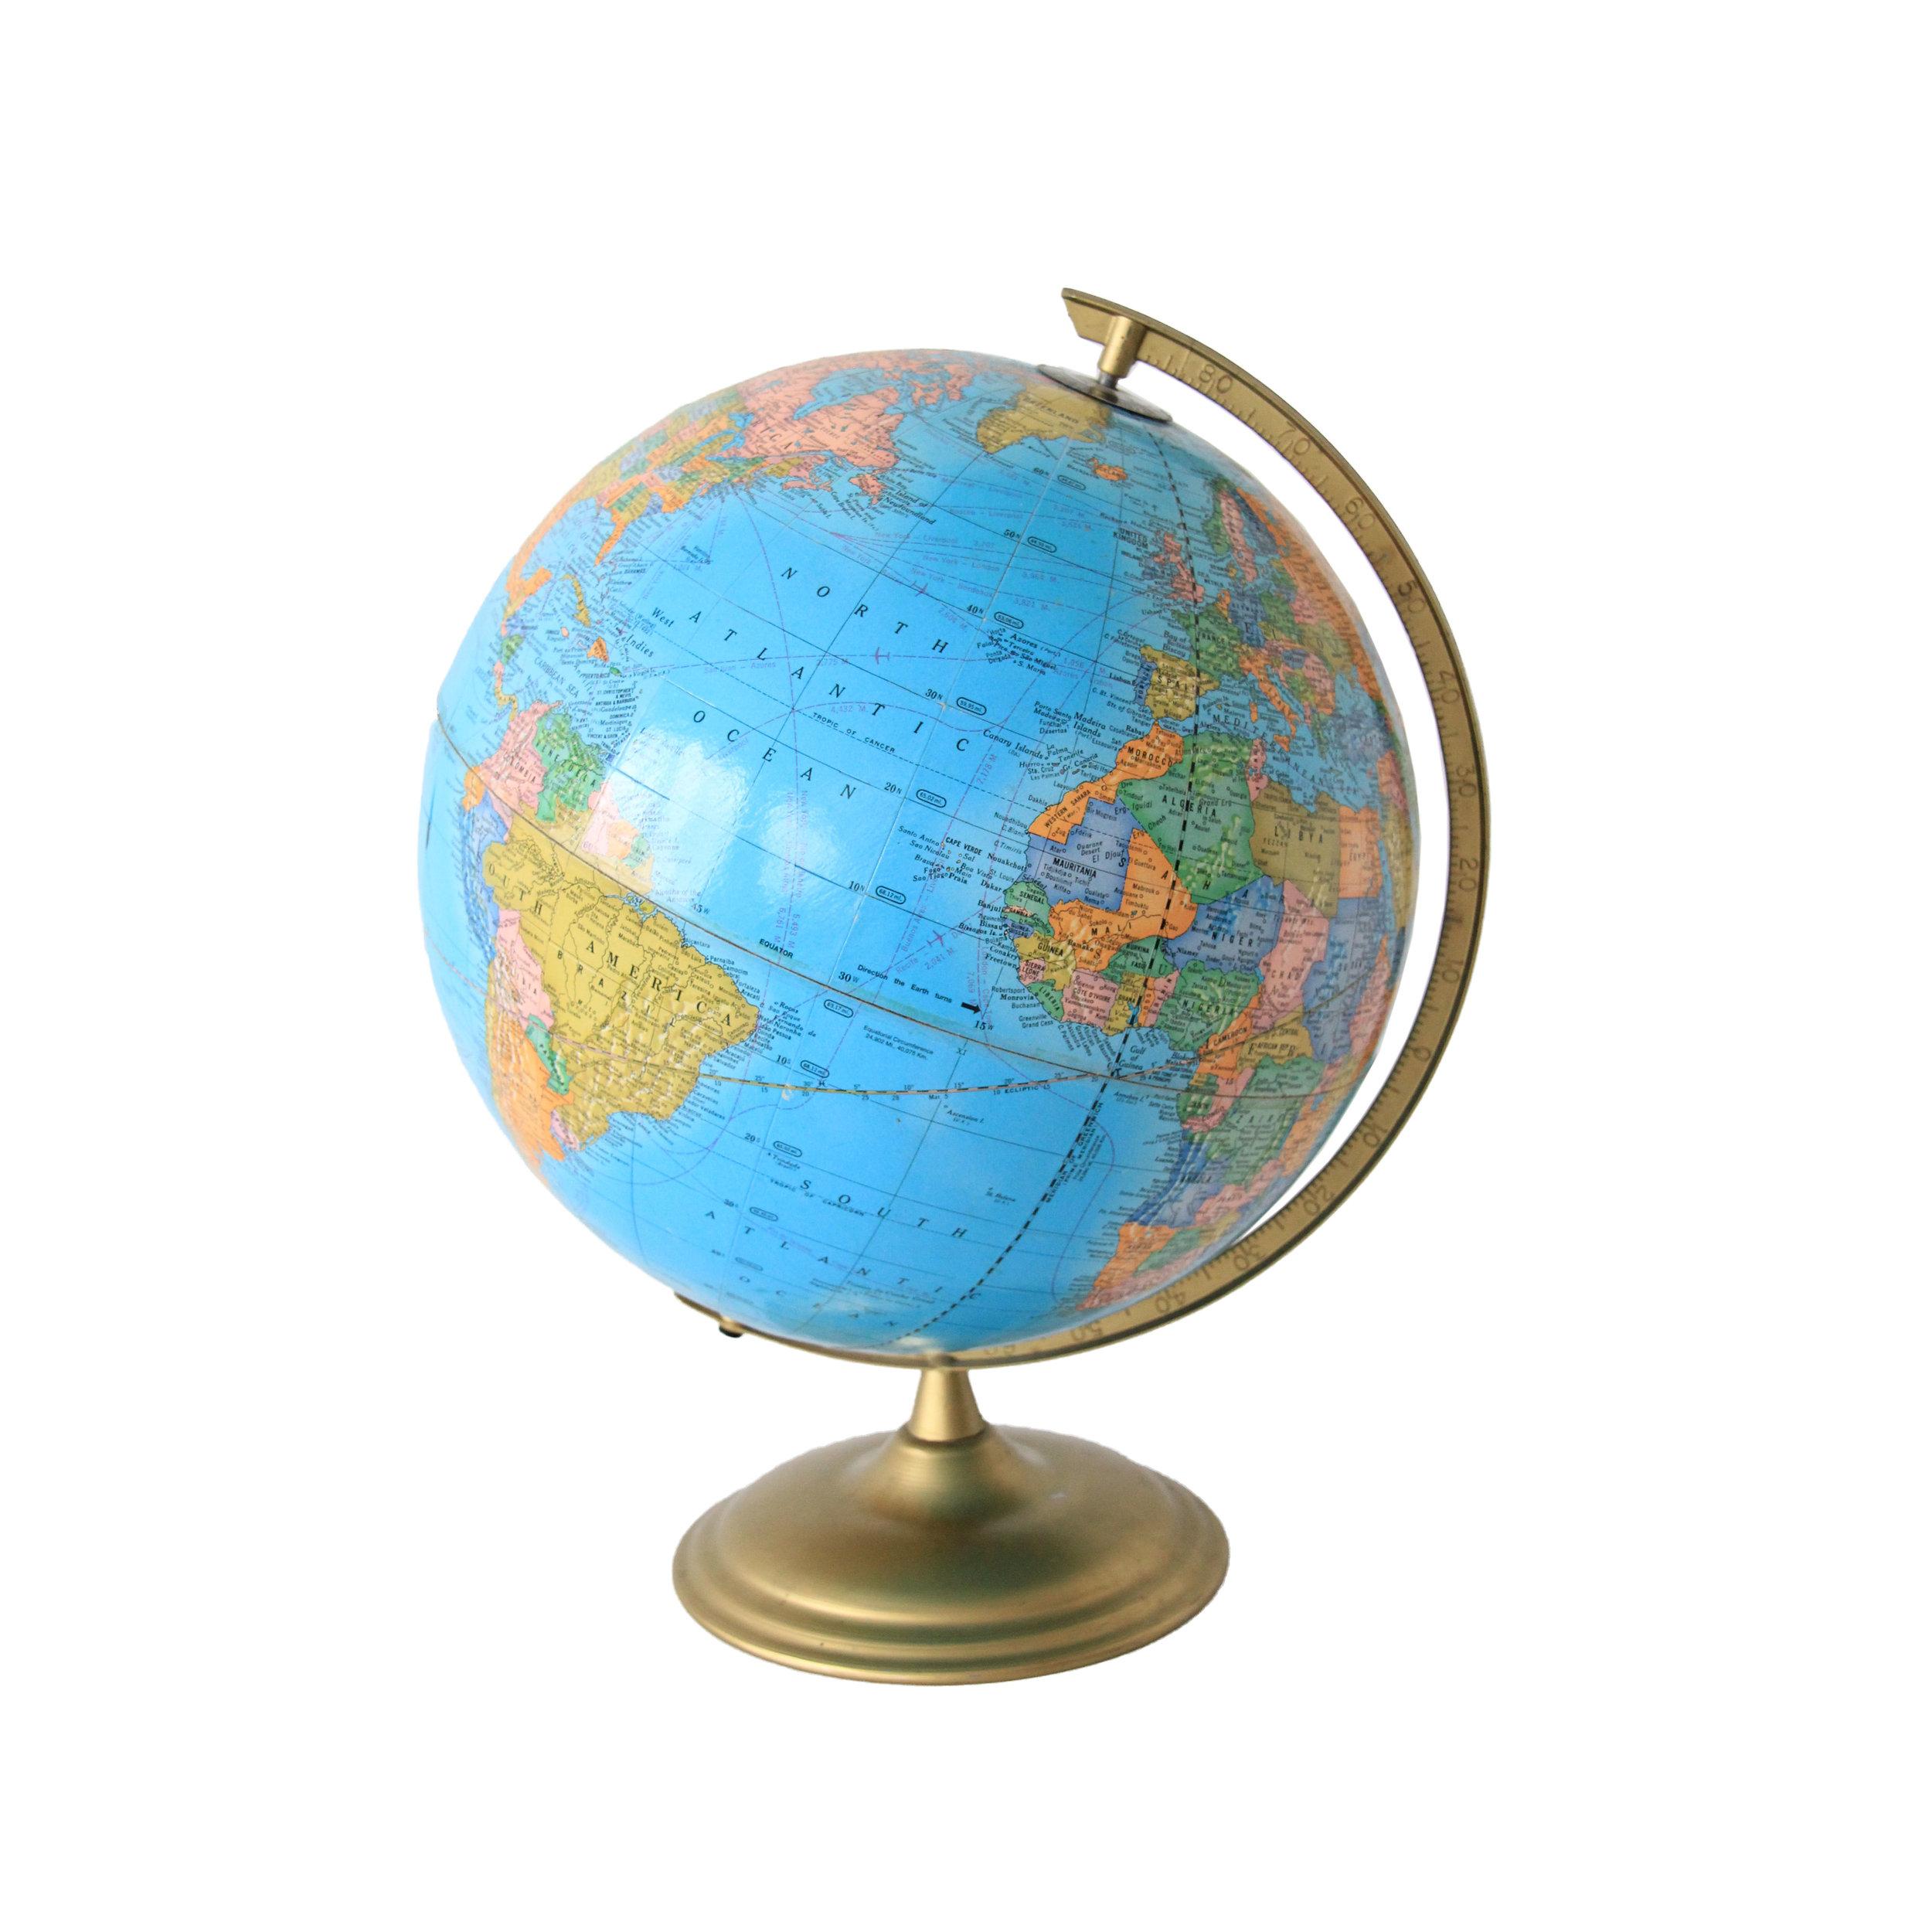 cram's imperial globe.jpg